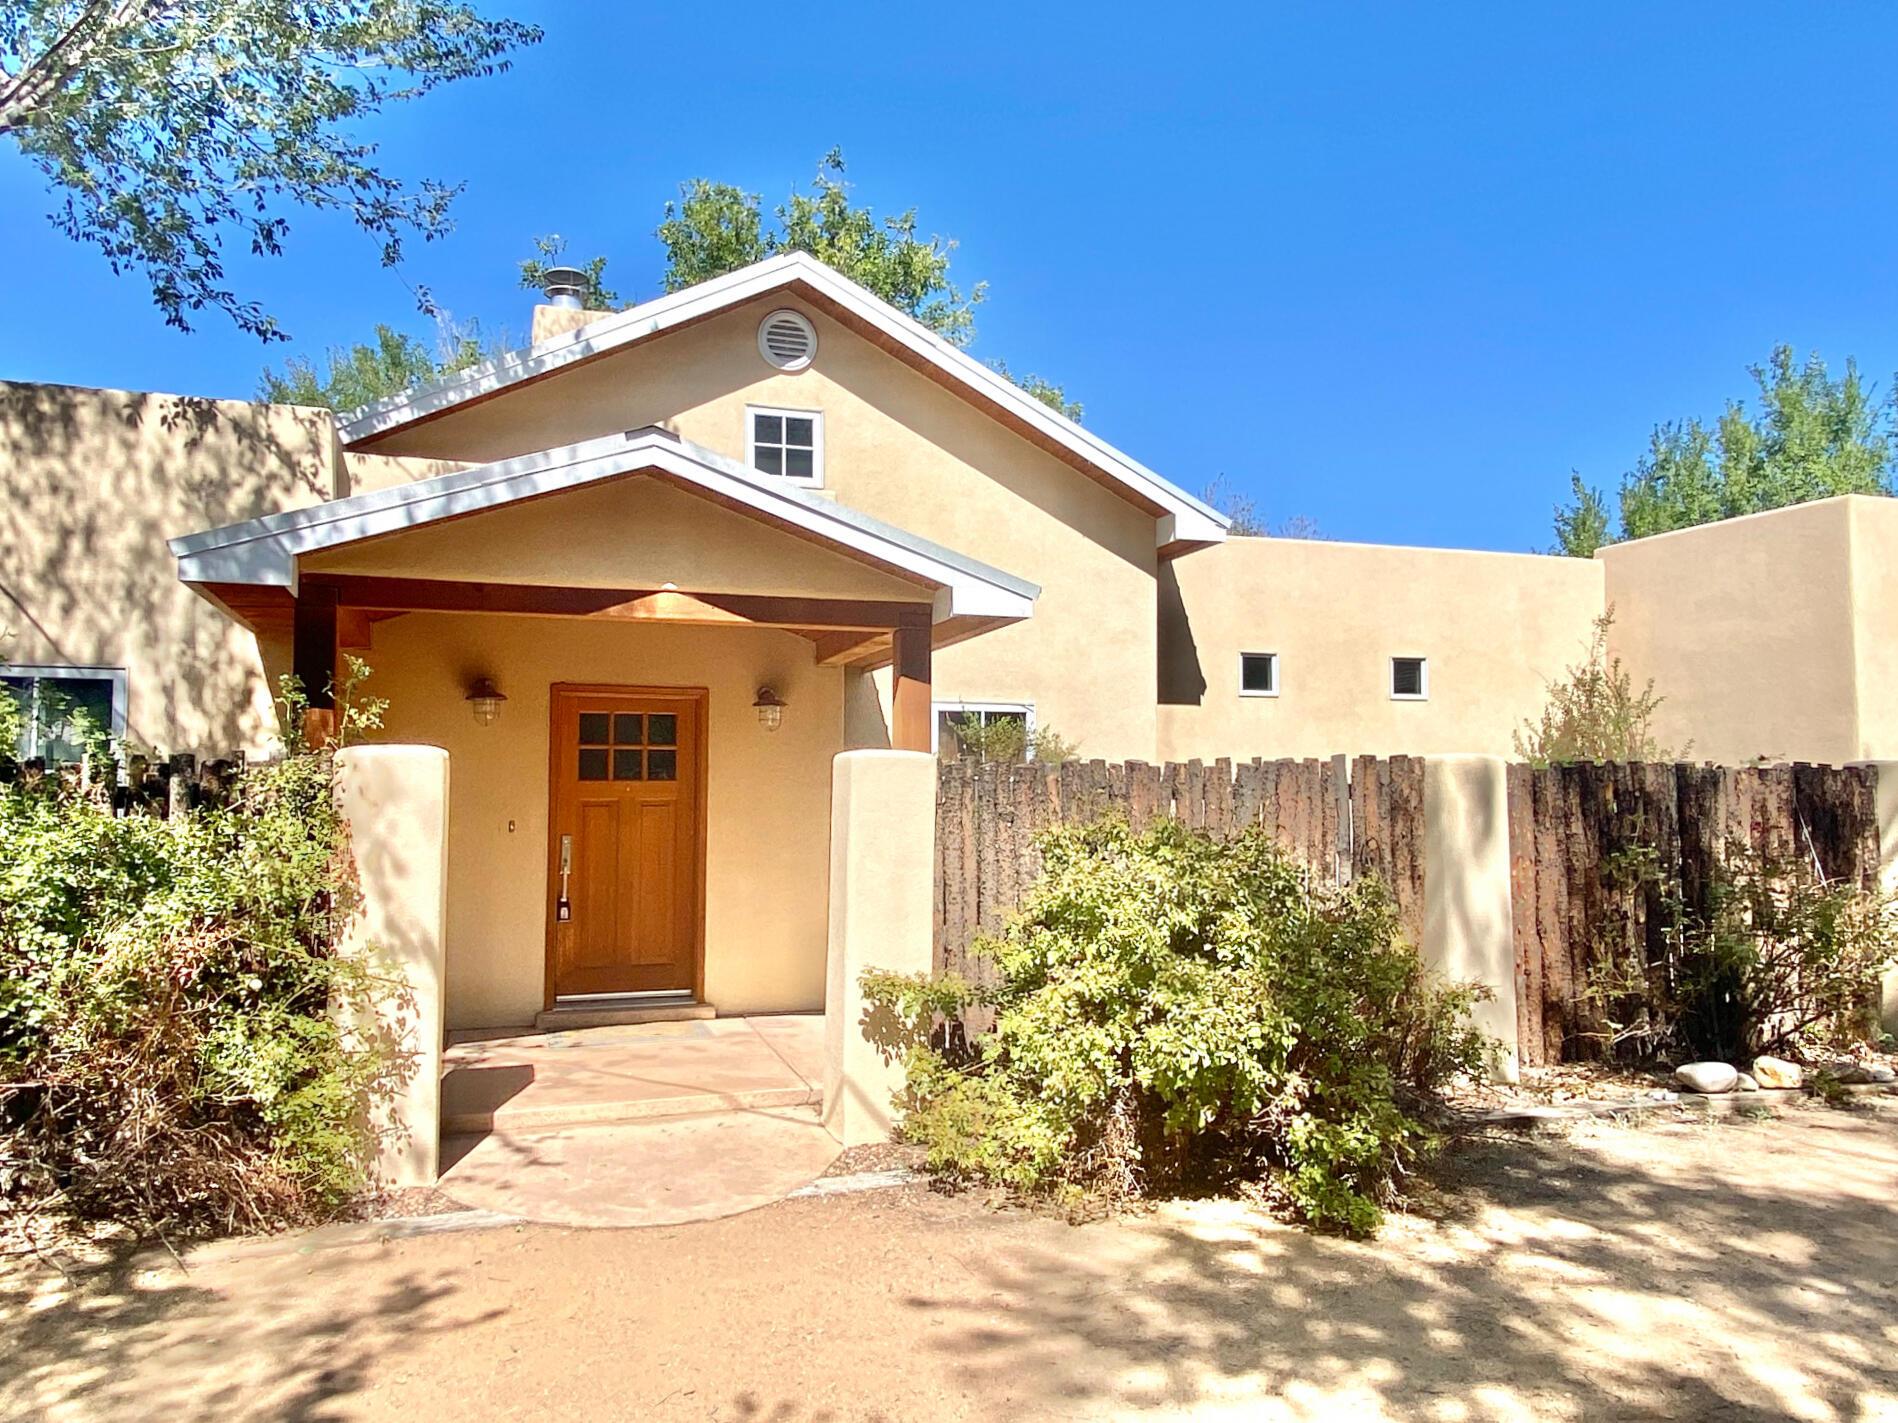 529 Camino La Morada Nw Property Photo